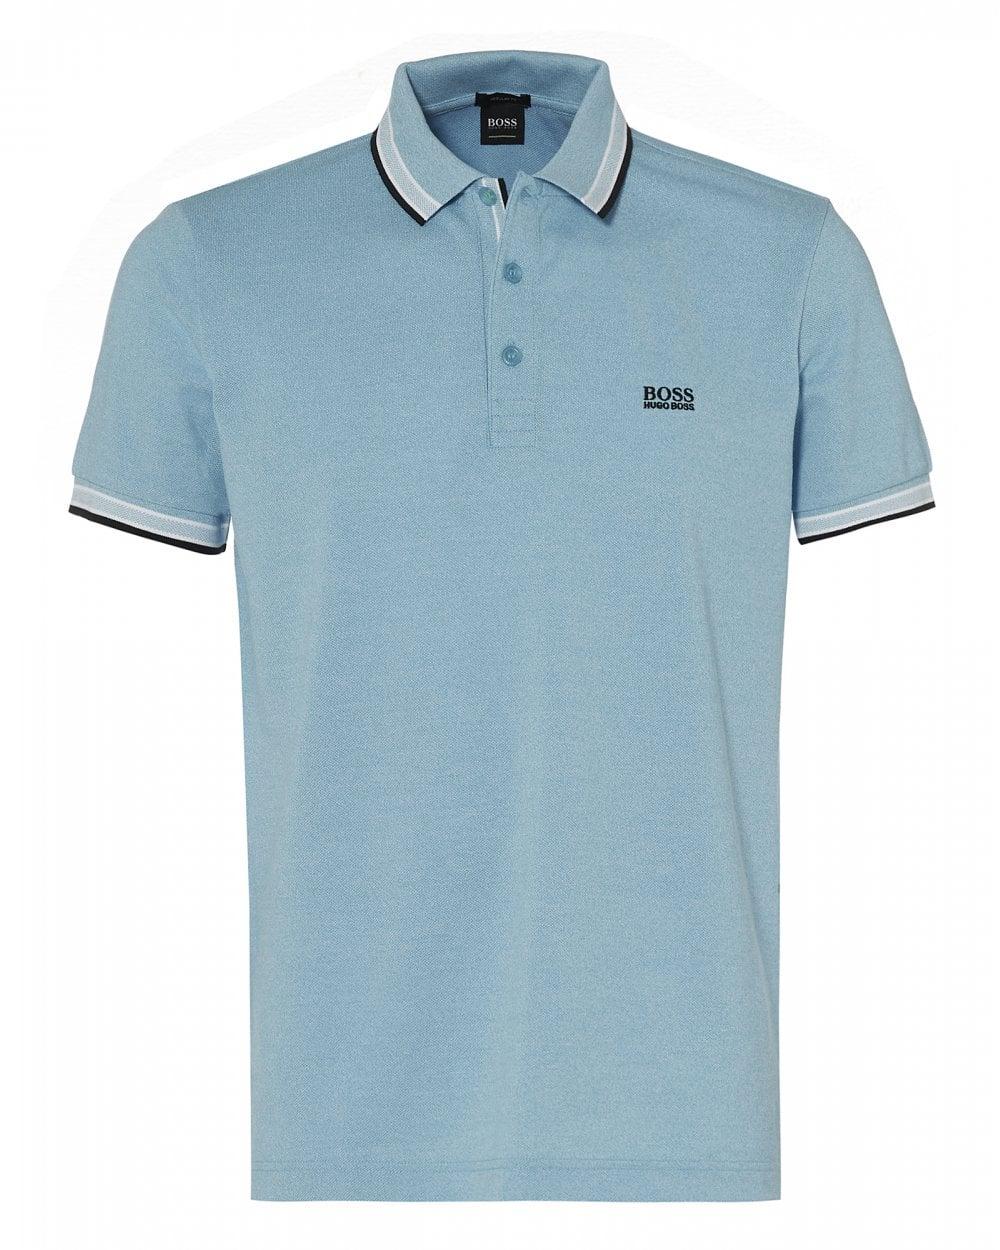 080820fe BOSS Athleisure Mens Paddy Polo Shirt, Tipped Aqua Blue Polo